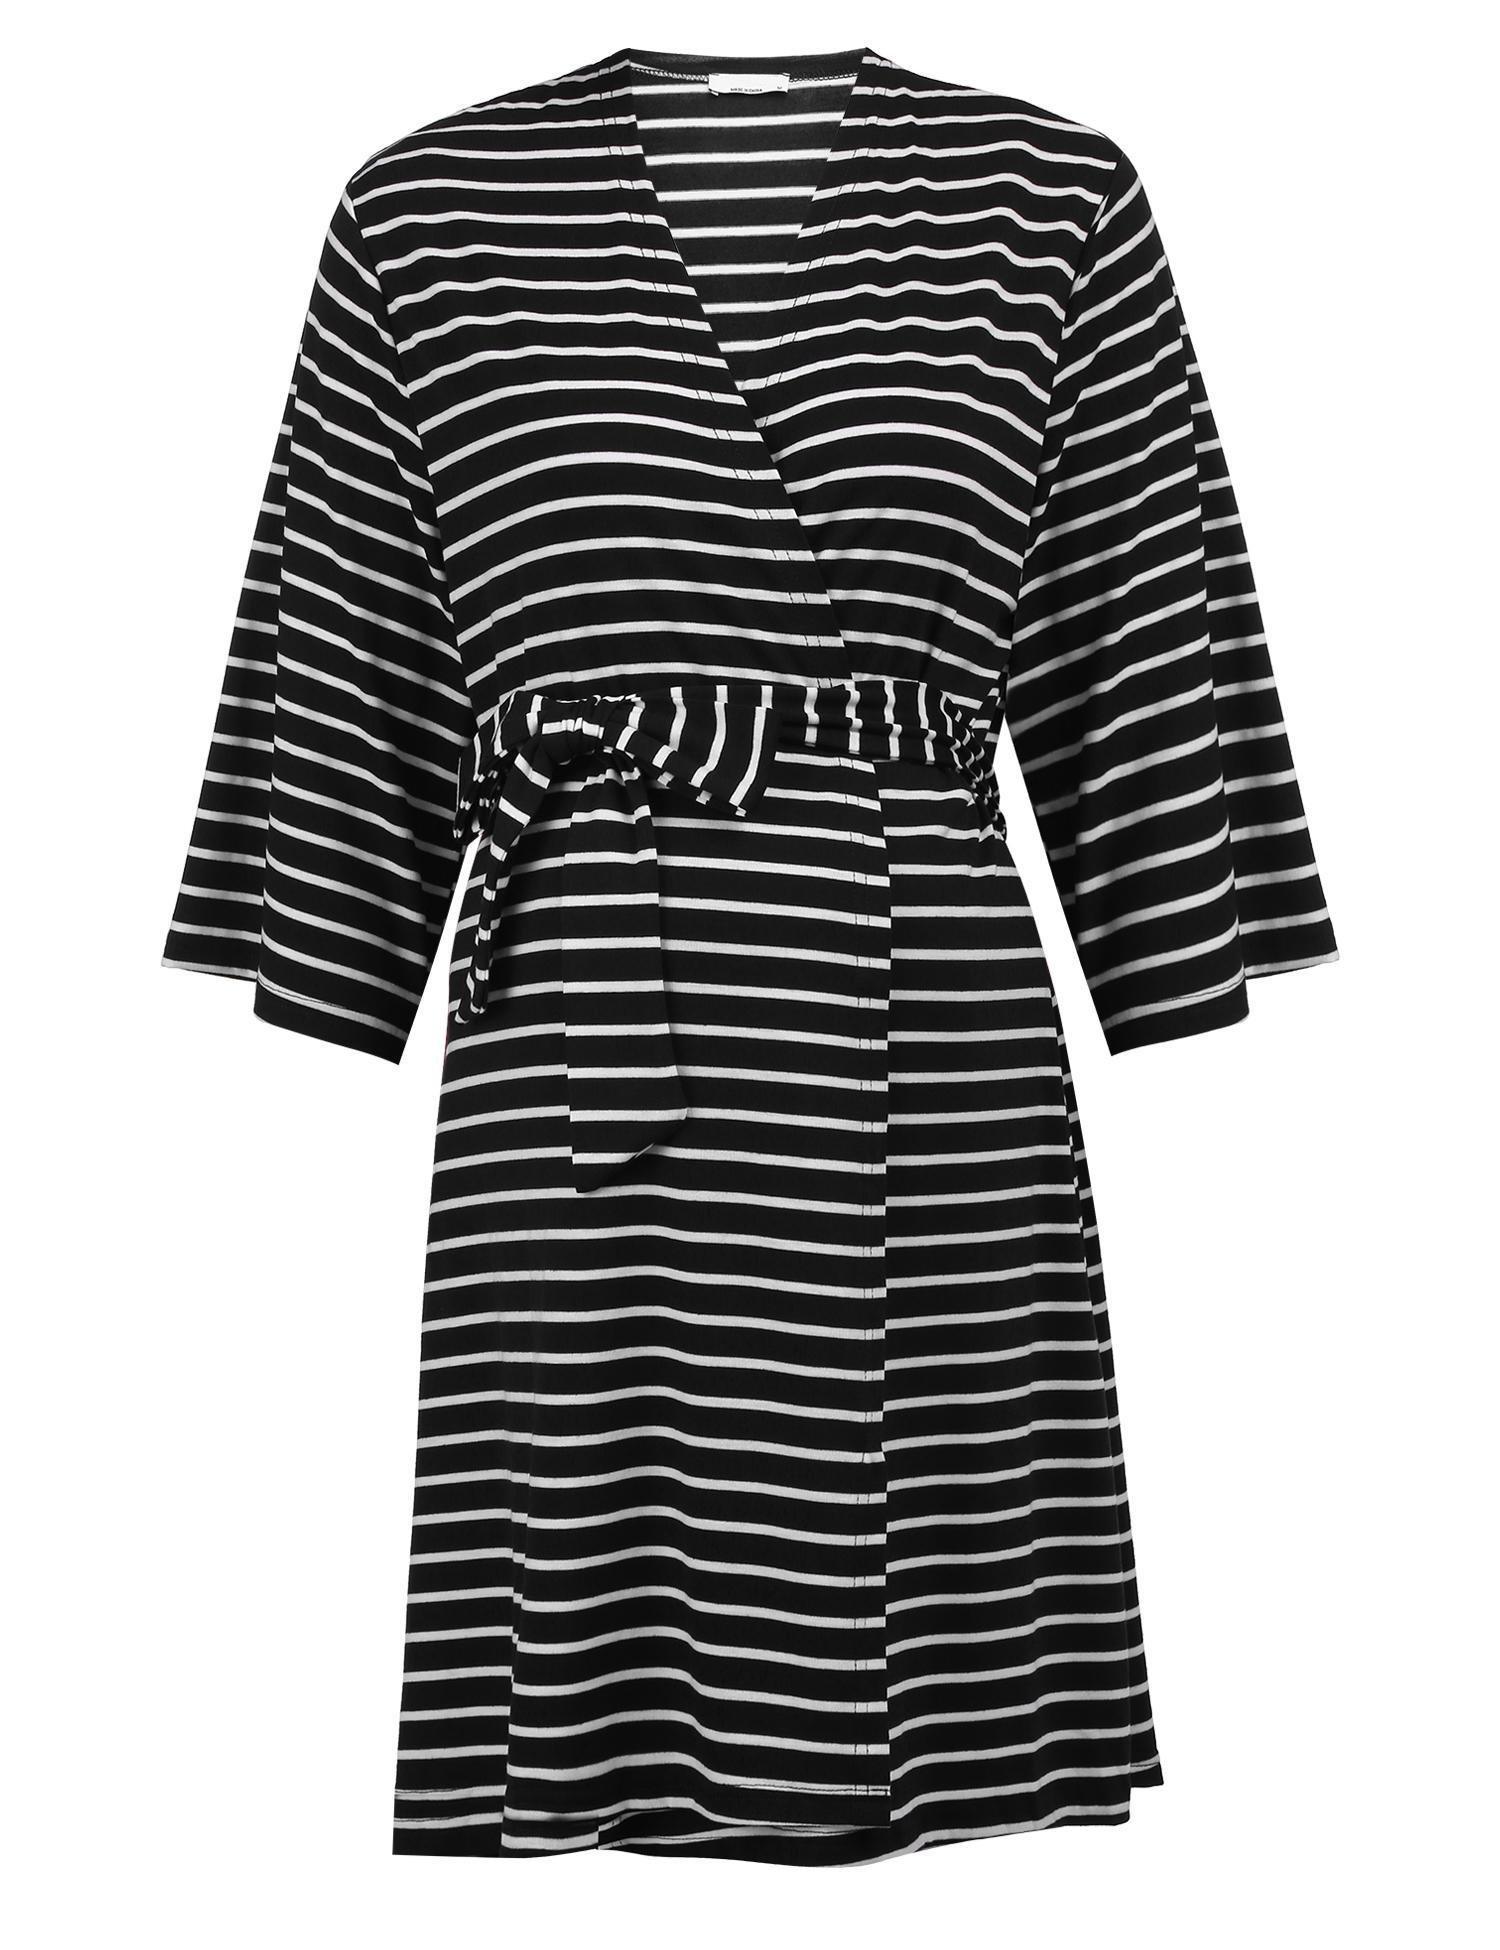 Skylin Maternity Nursing Nightgown Long Sleeve Breastfeeding Bath Robes (Black, XL)